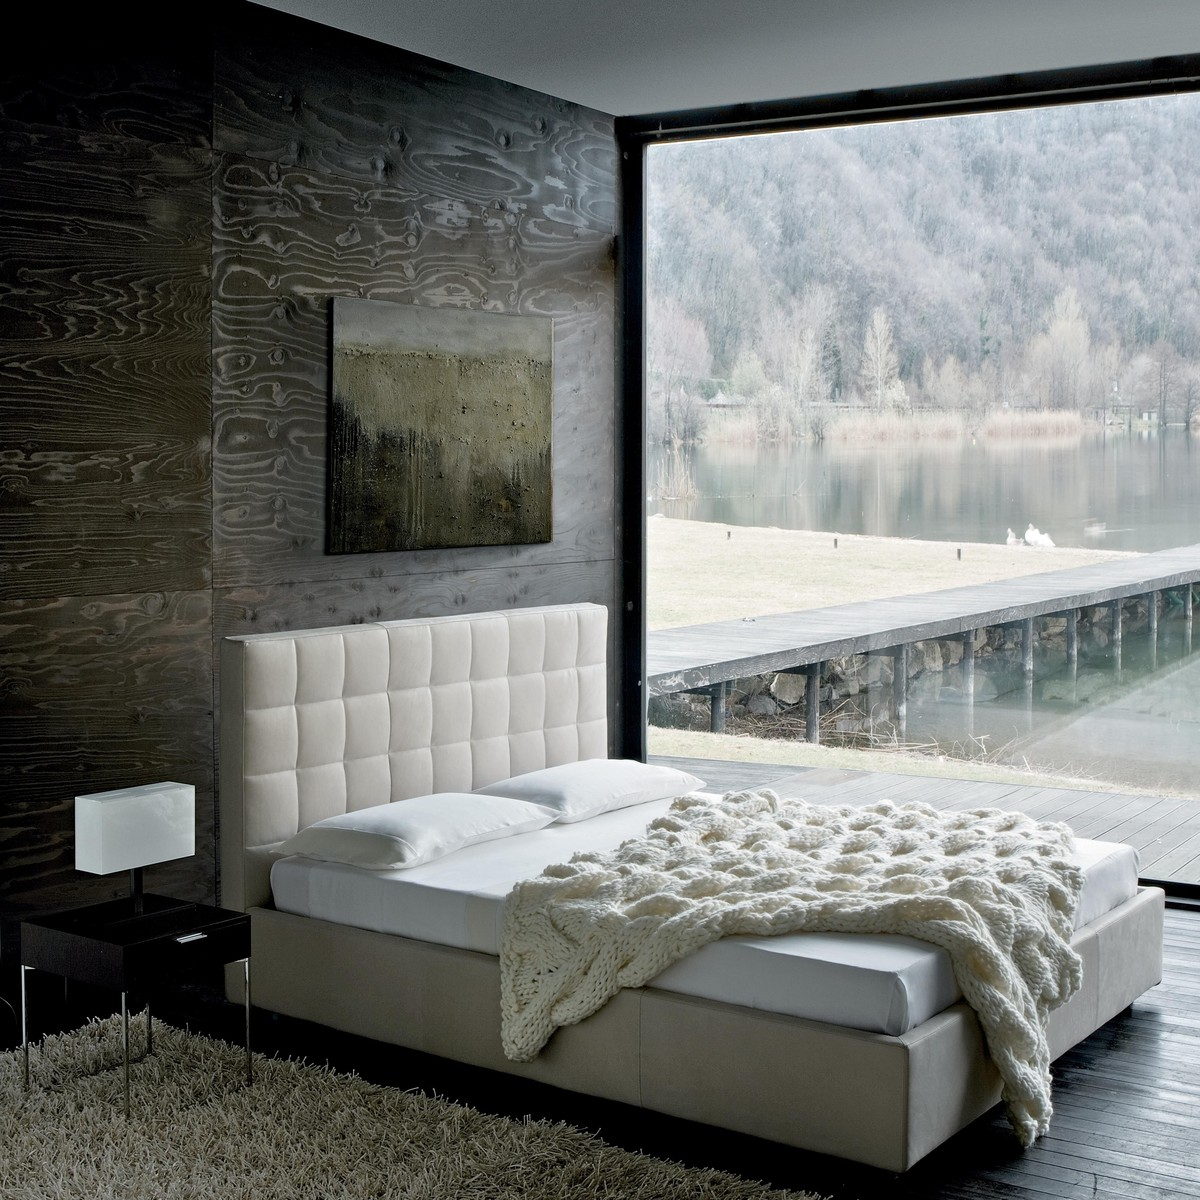 overbox doppelbett mit bettkasten zanotta. Black Bedroom Furniture Sets. Home Design Ideas